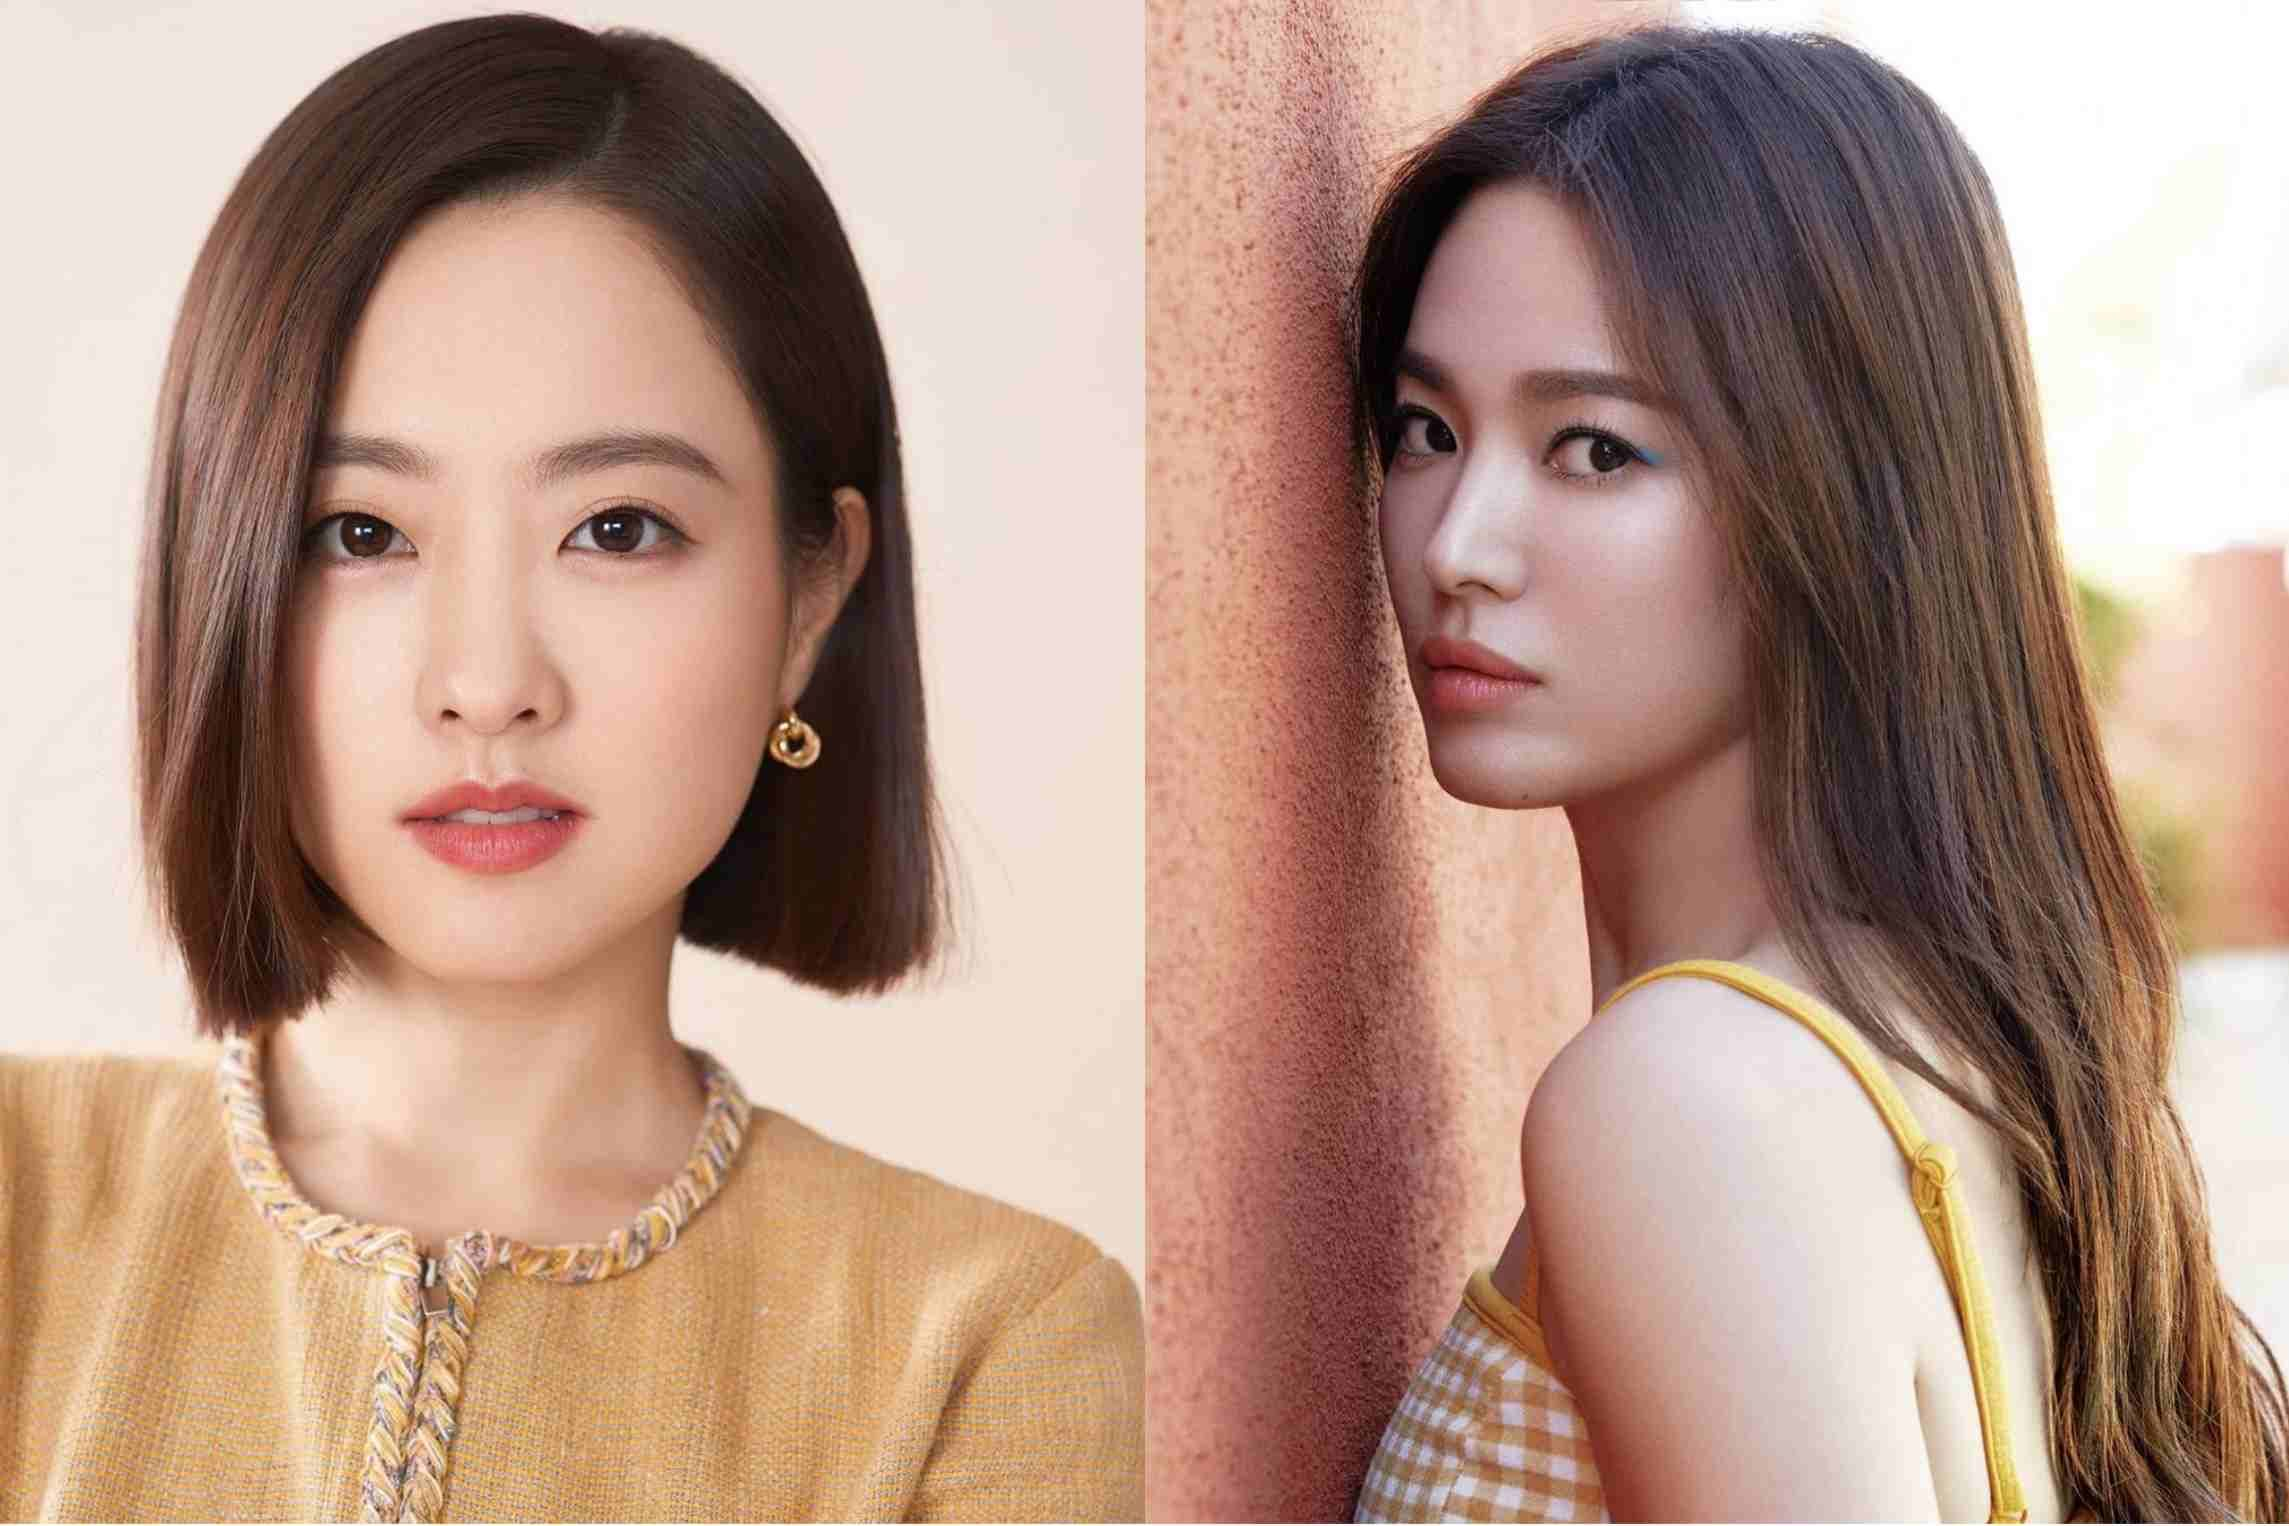 Deretan 20 Aktris Korea Yang Dilabeli Cantik Sepanjang Masa Di 2020 Aktris Aktris Korea Korea